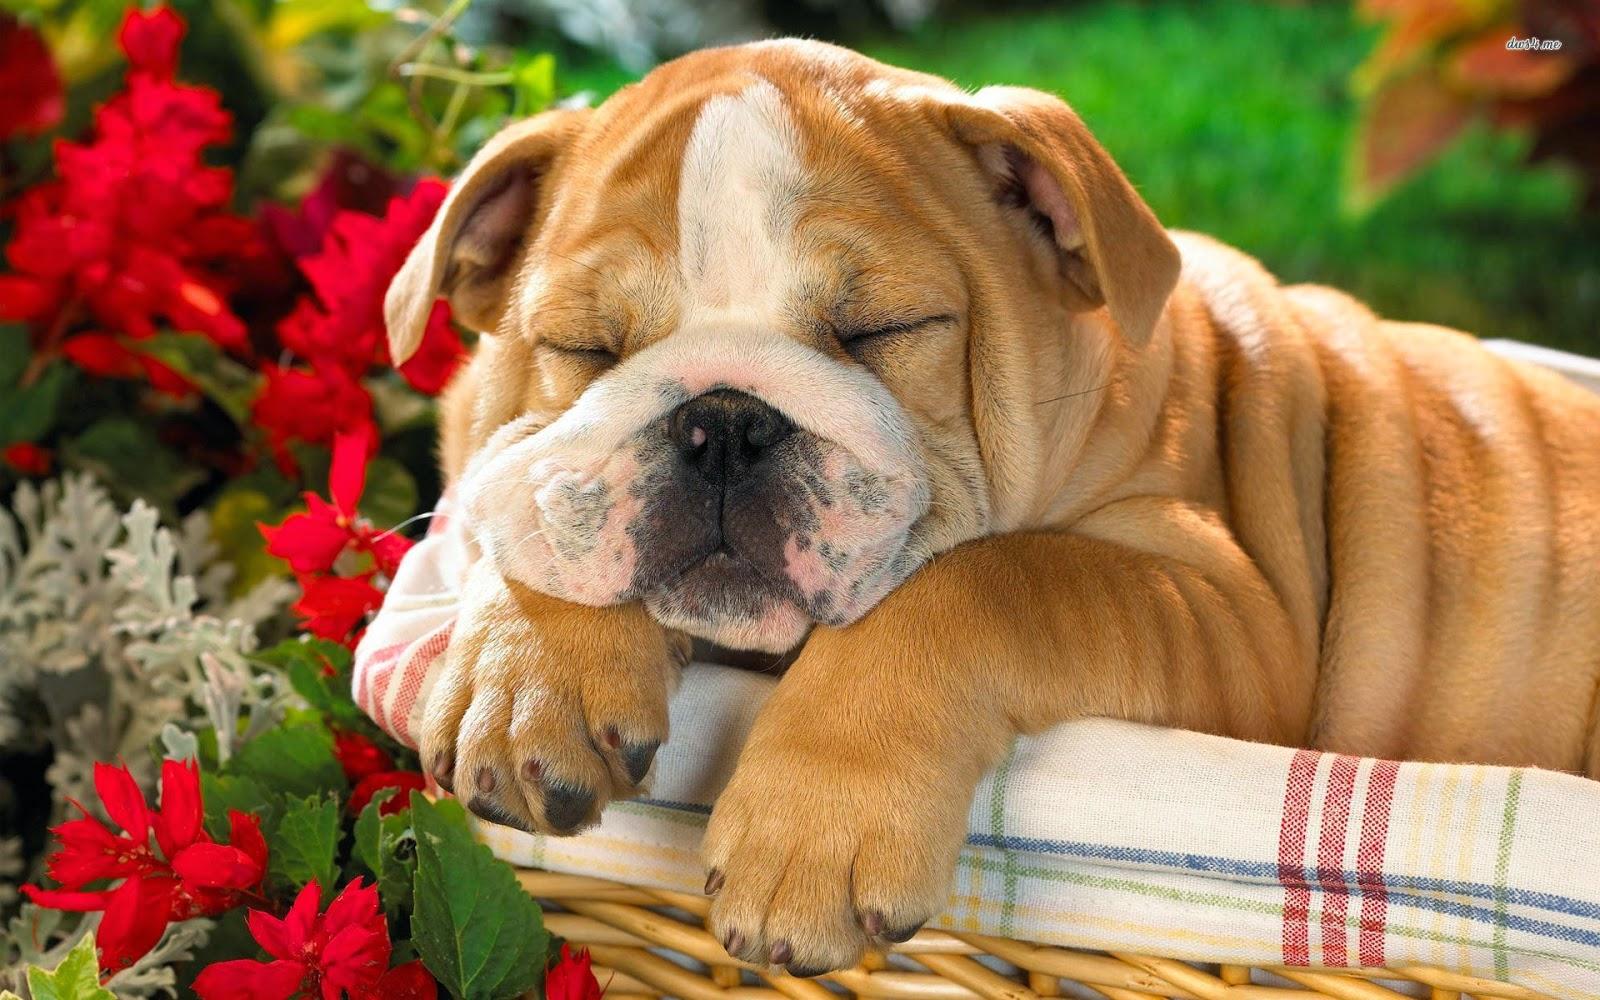 Rules of the Jungle: British Bulldog Puppies